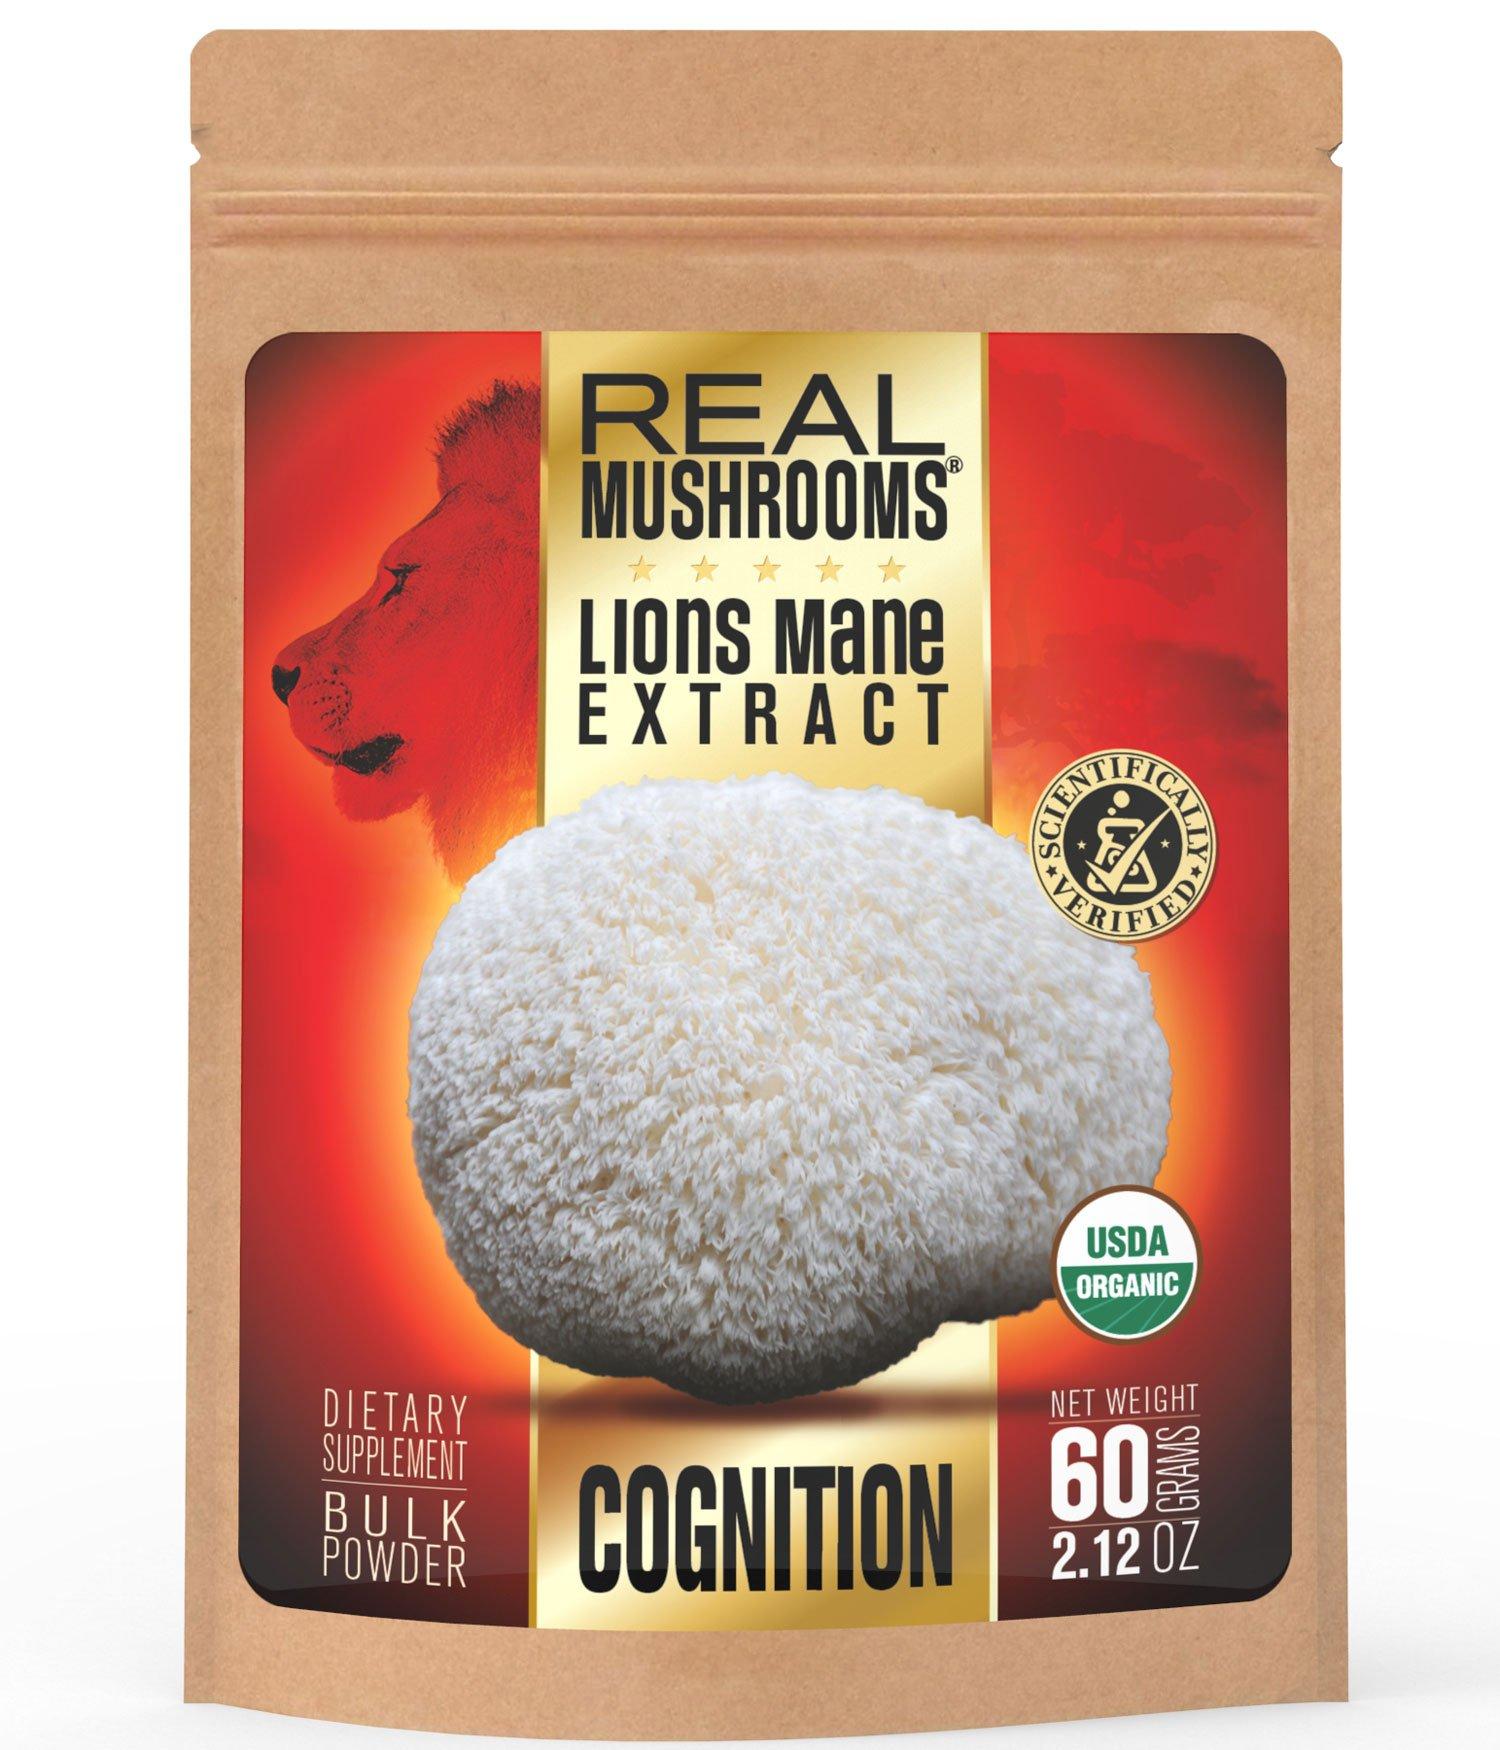 Lions Mane Mushroom Extract Powder by Real Mushrooms - Certified Organic - 60g Bulk Lion's Mane Mushroom Powder - Perfect for Shakes, Smoothies, Coffee and Tea